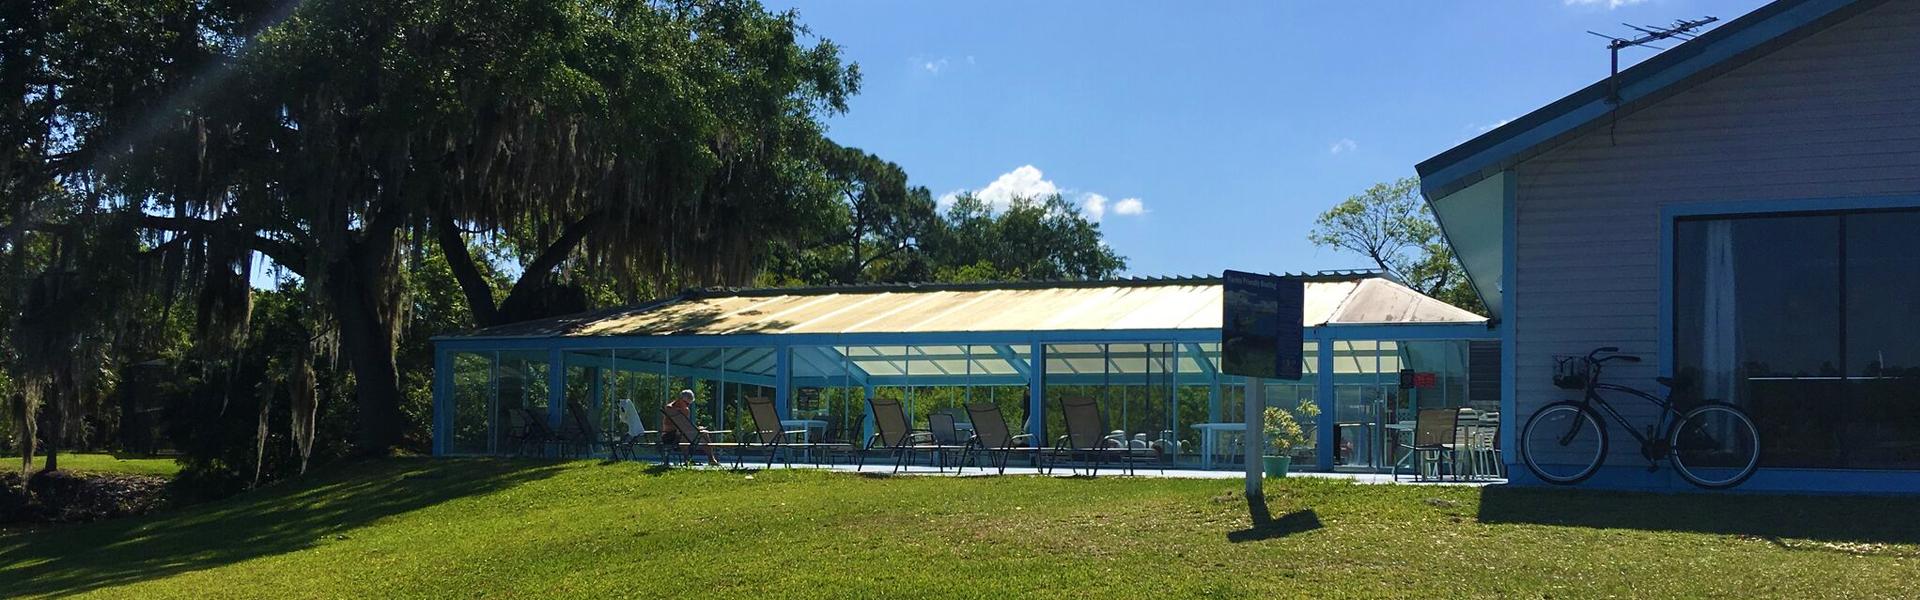 Moss Landing LaBelle Florida 55+ Mobile Home Community & RV